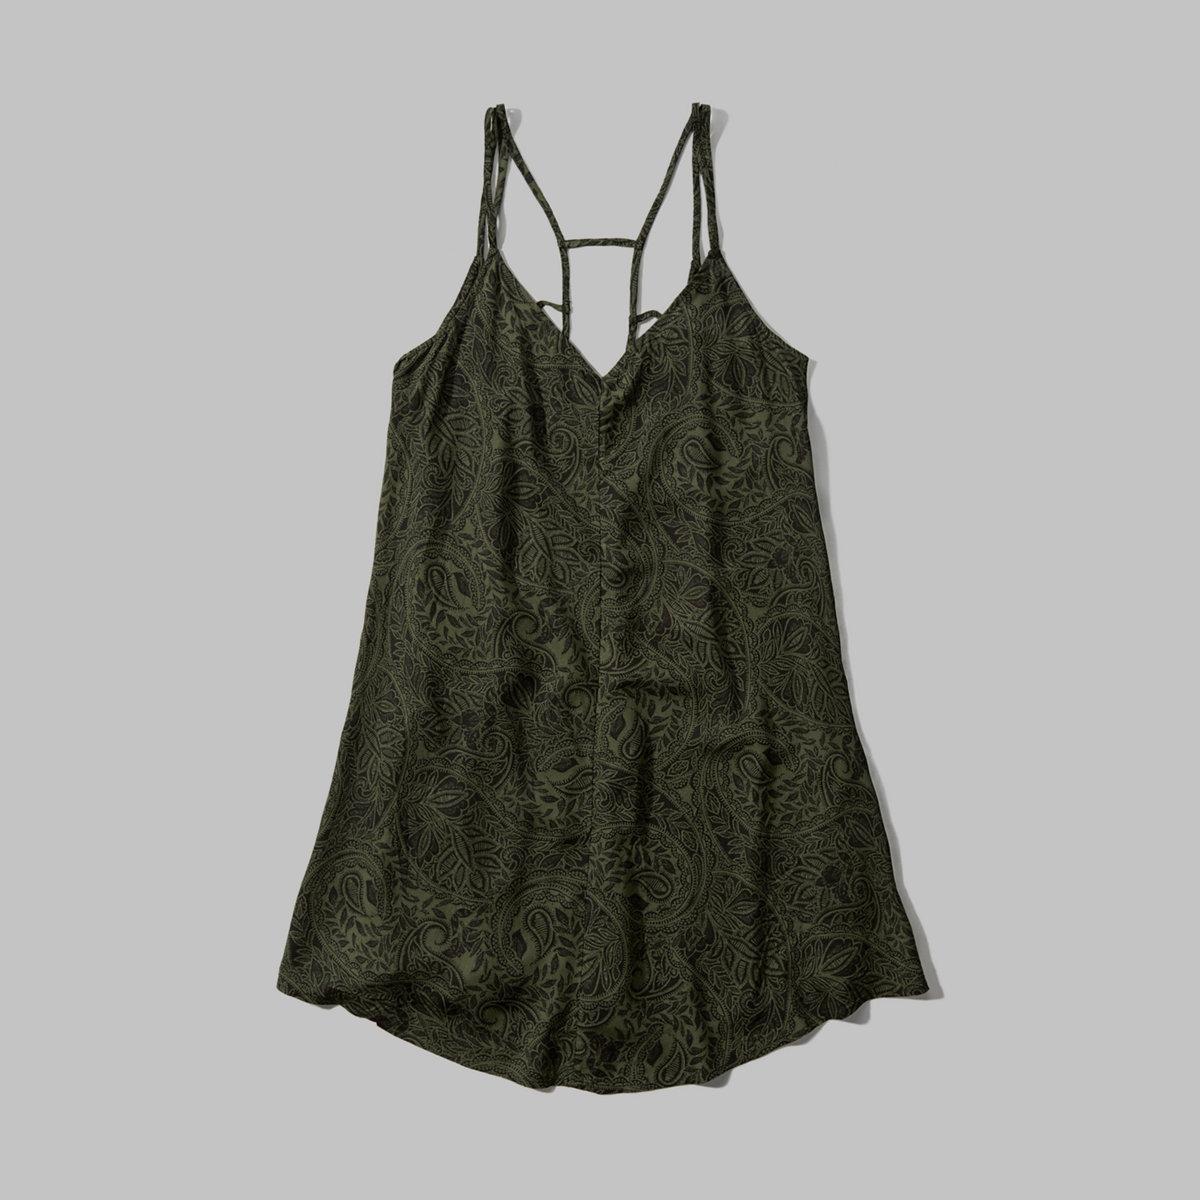 Patterned Strappy Swing Dress